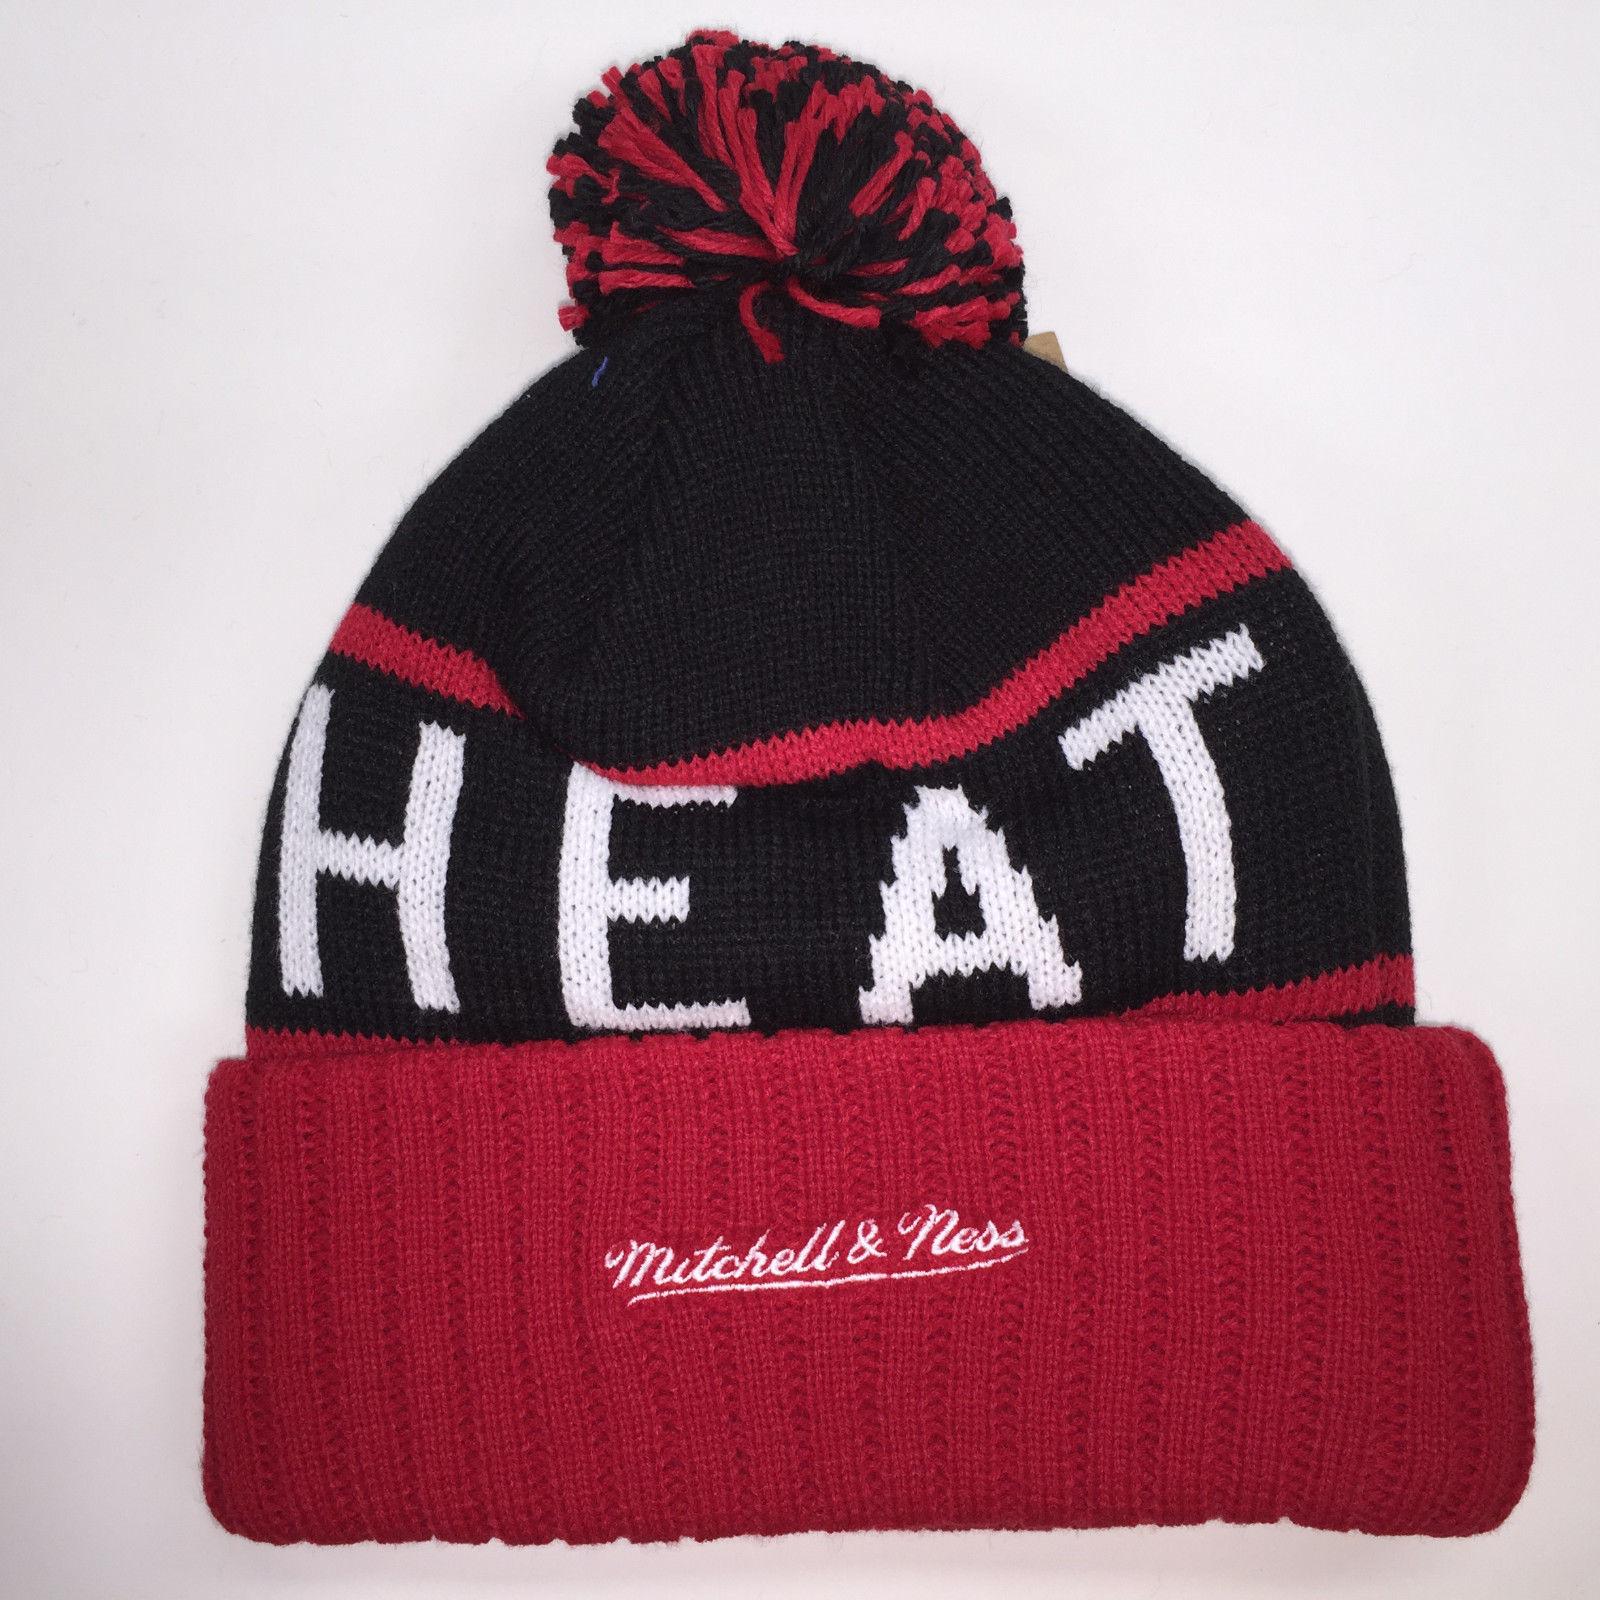 Mitchell & Ness NBA Miami Heat High 5 Cuffed Knit Beanie 11895